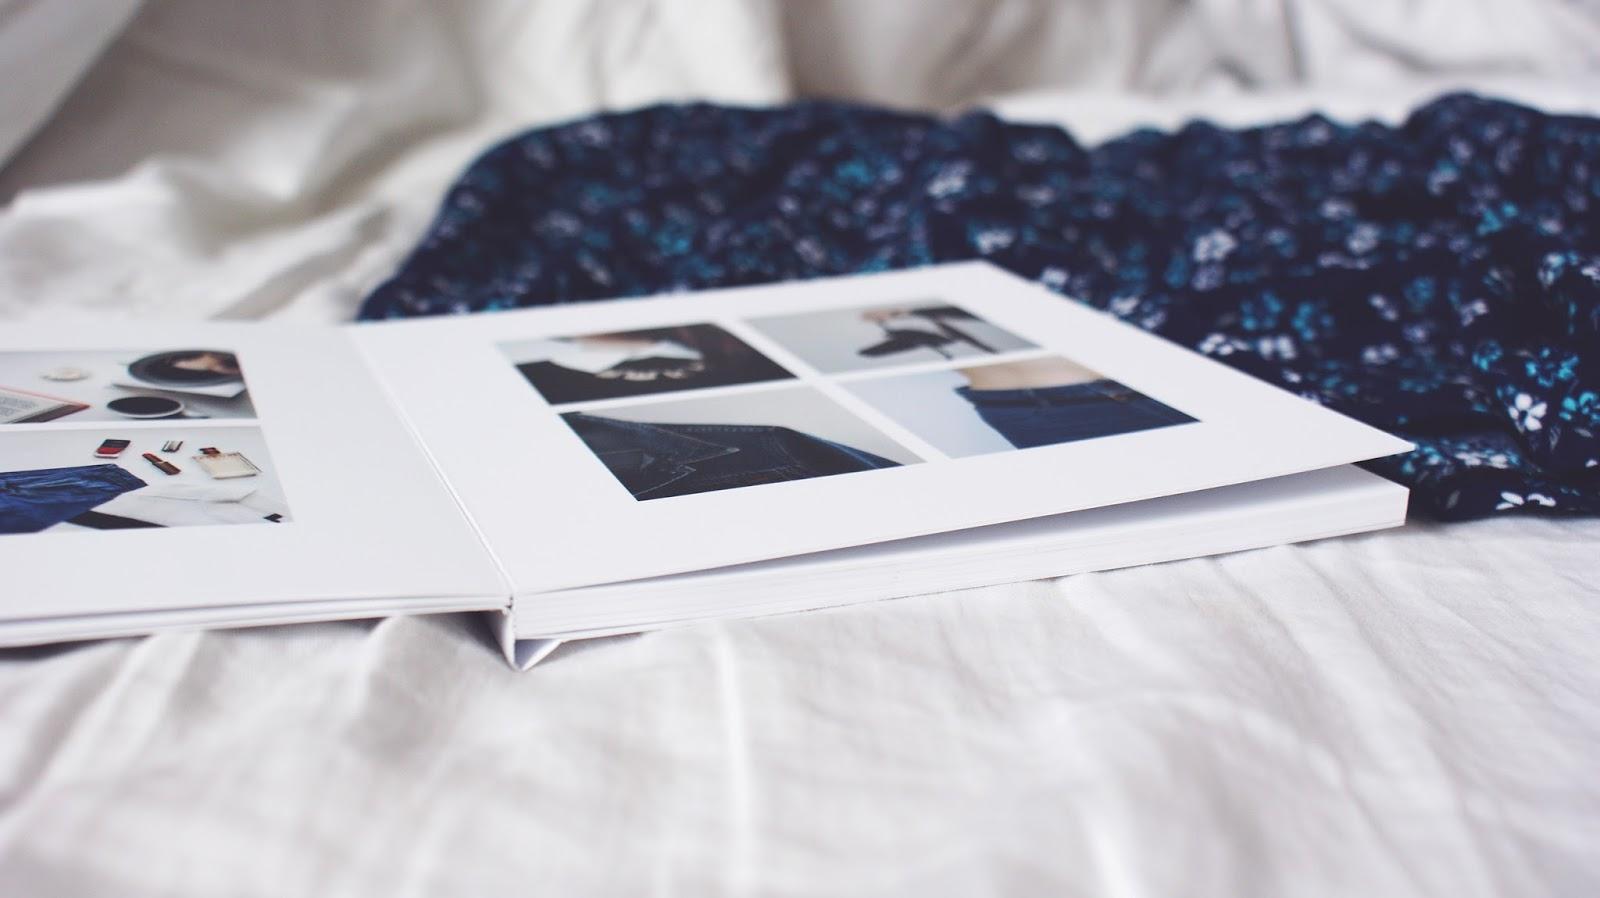 instagram, instabook, kod rabatowy instabook, album, zdjęcia, Ed Sheeran, Photograph